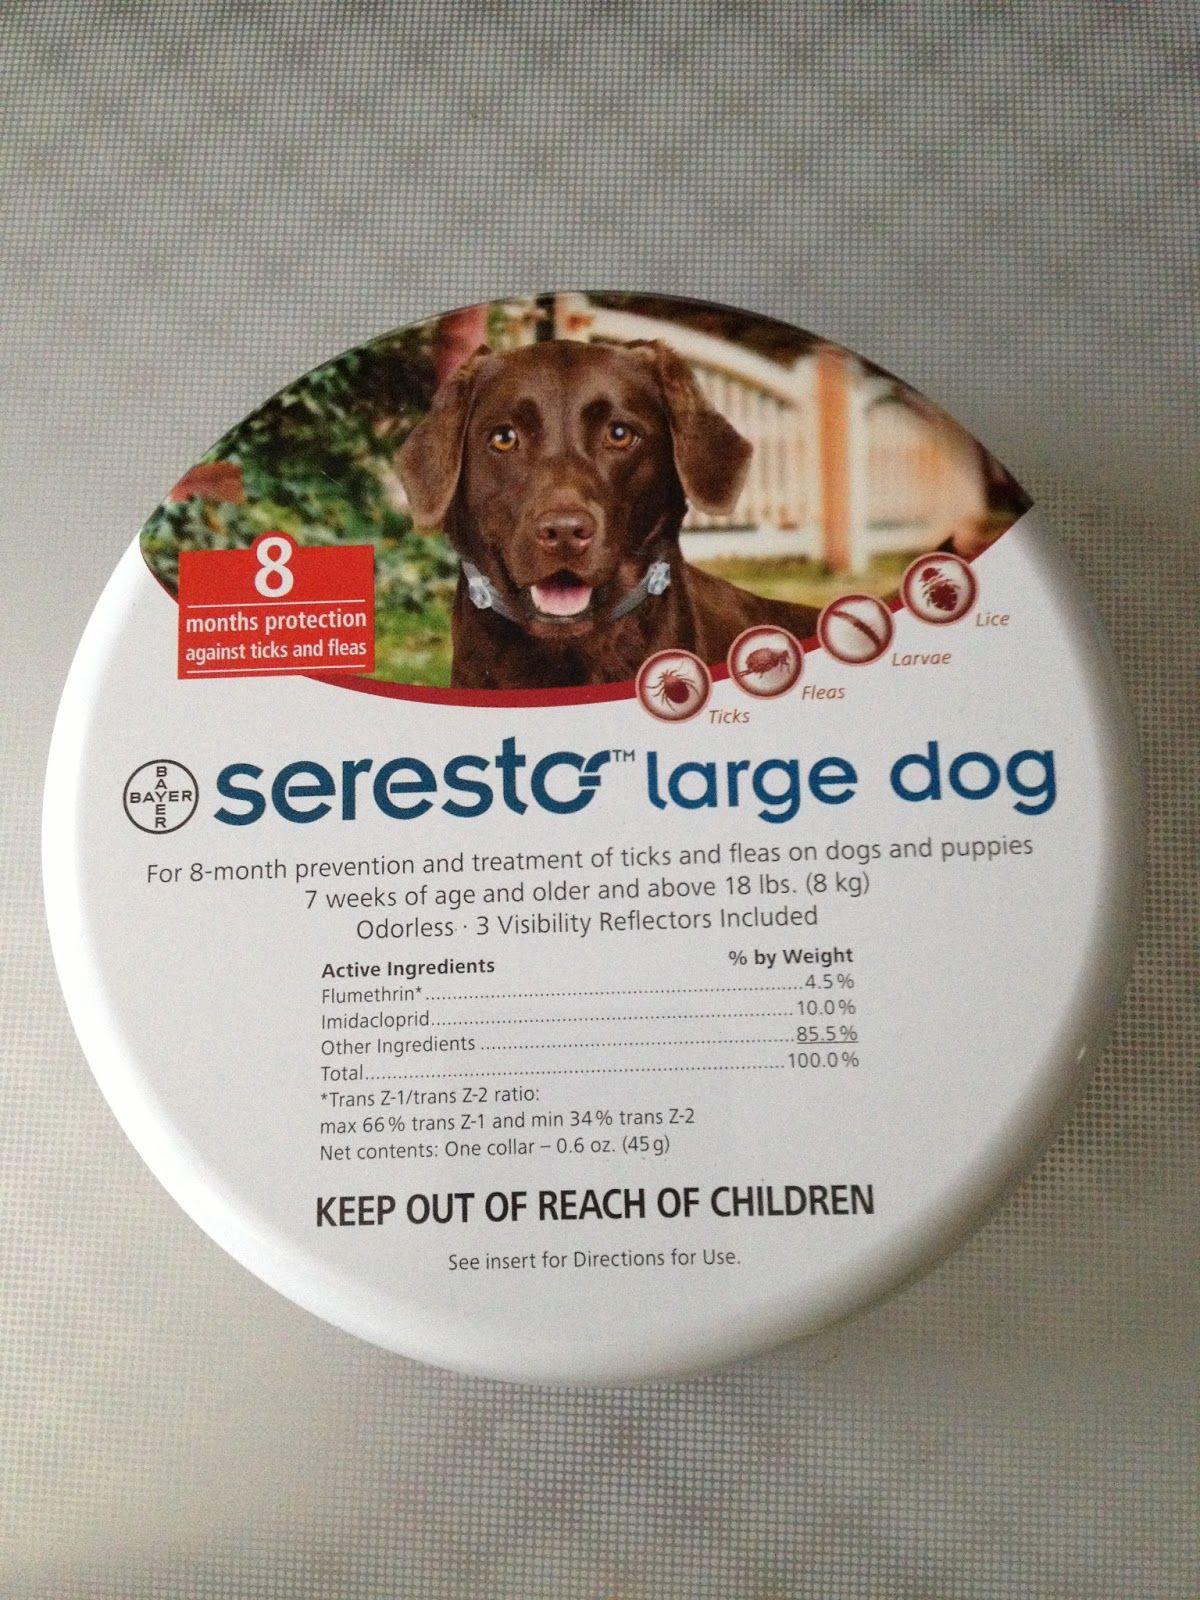 Seresto Is The Gray Collar Above The Purple Collar Dog Flea Treatment Flea Shampoo For Dogs Flea Treatment